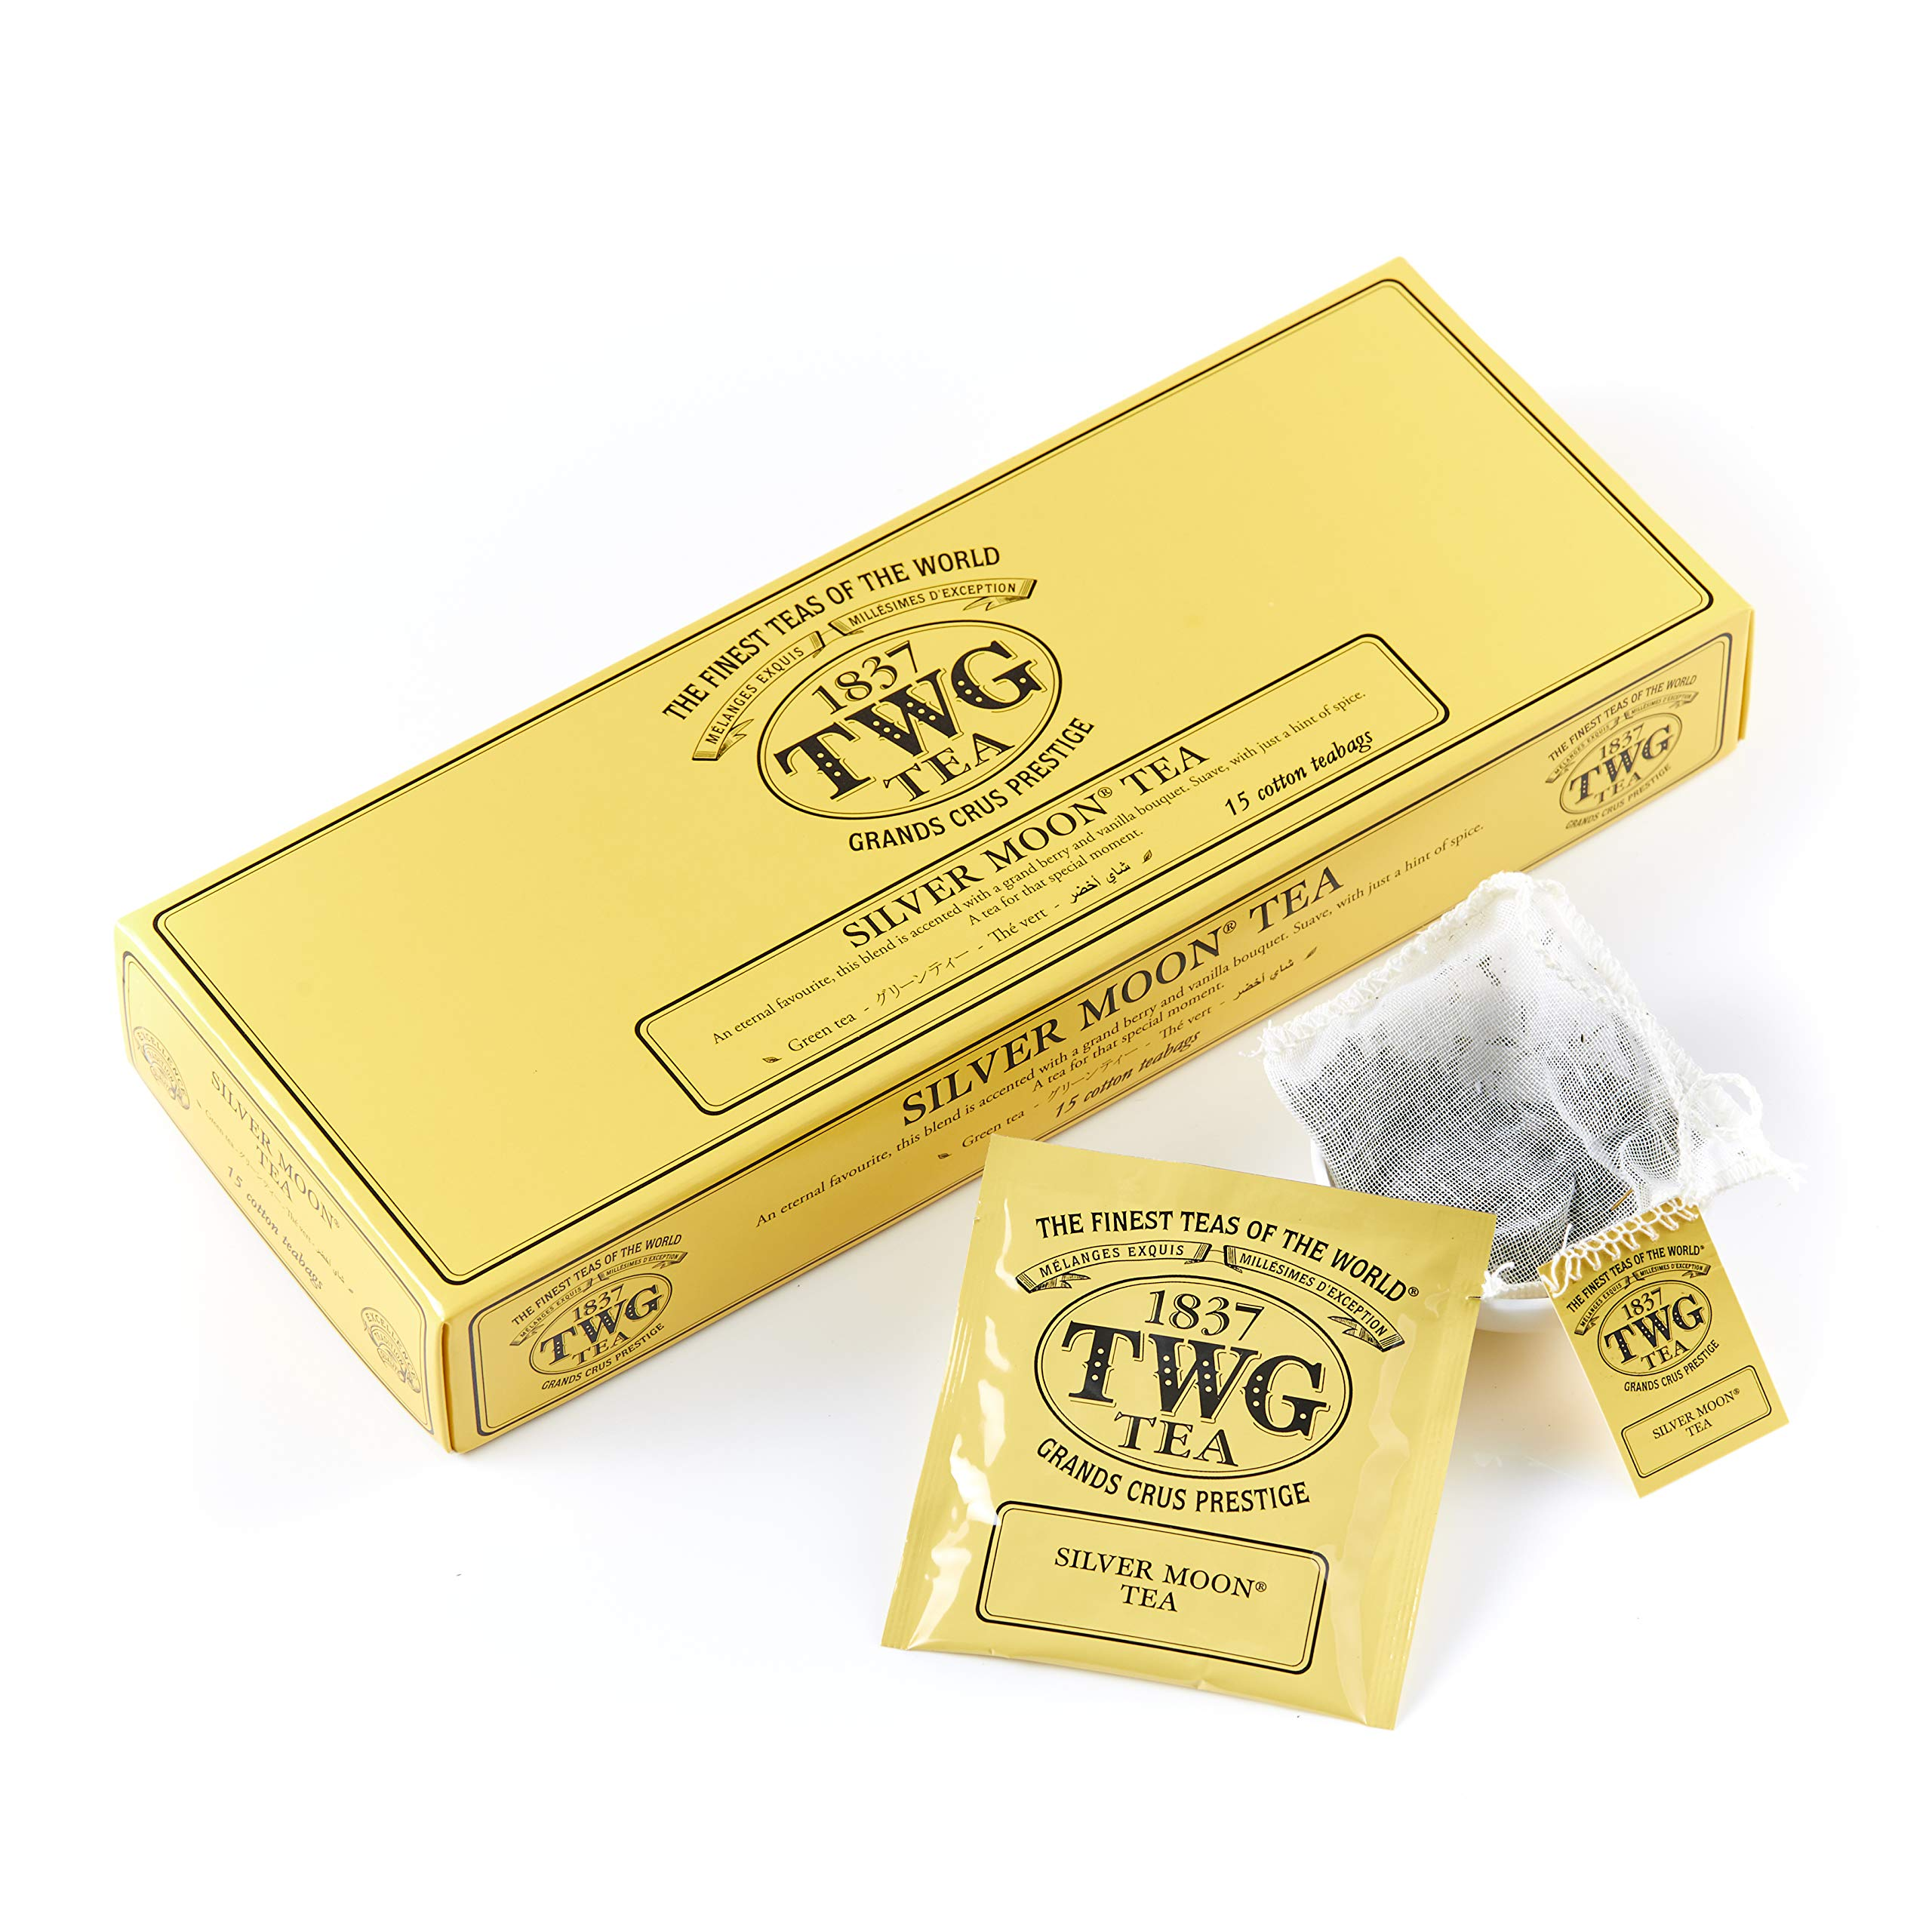 TWG Tea - Silver Moon Tea (PACKTB6018) - 15 x 2.5gr Tea bags